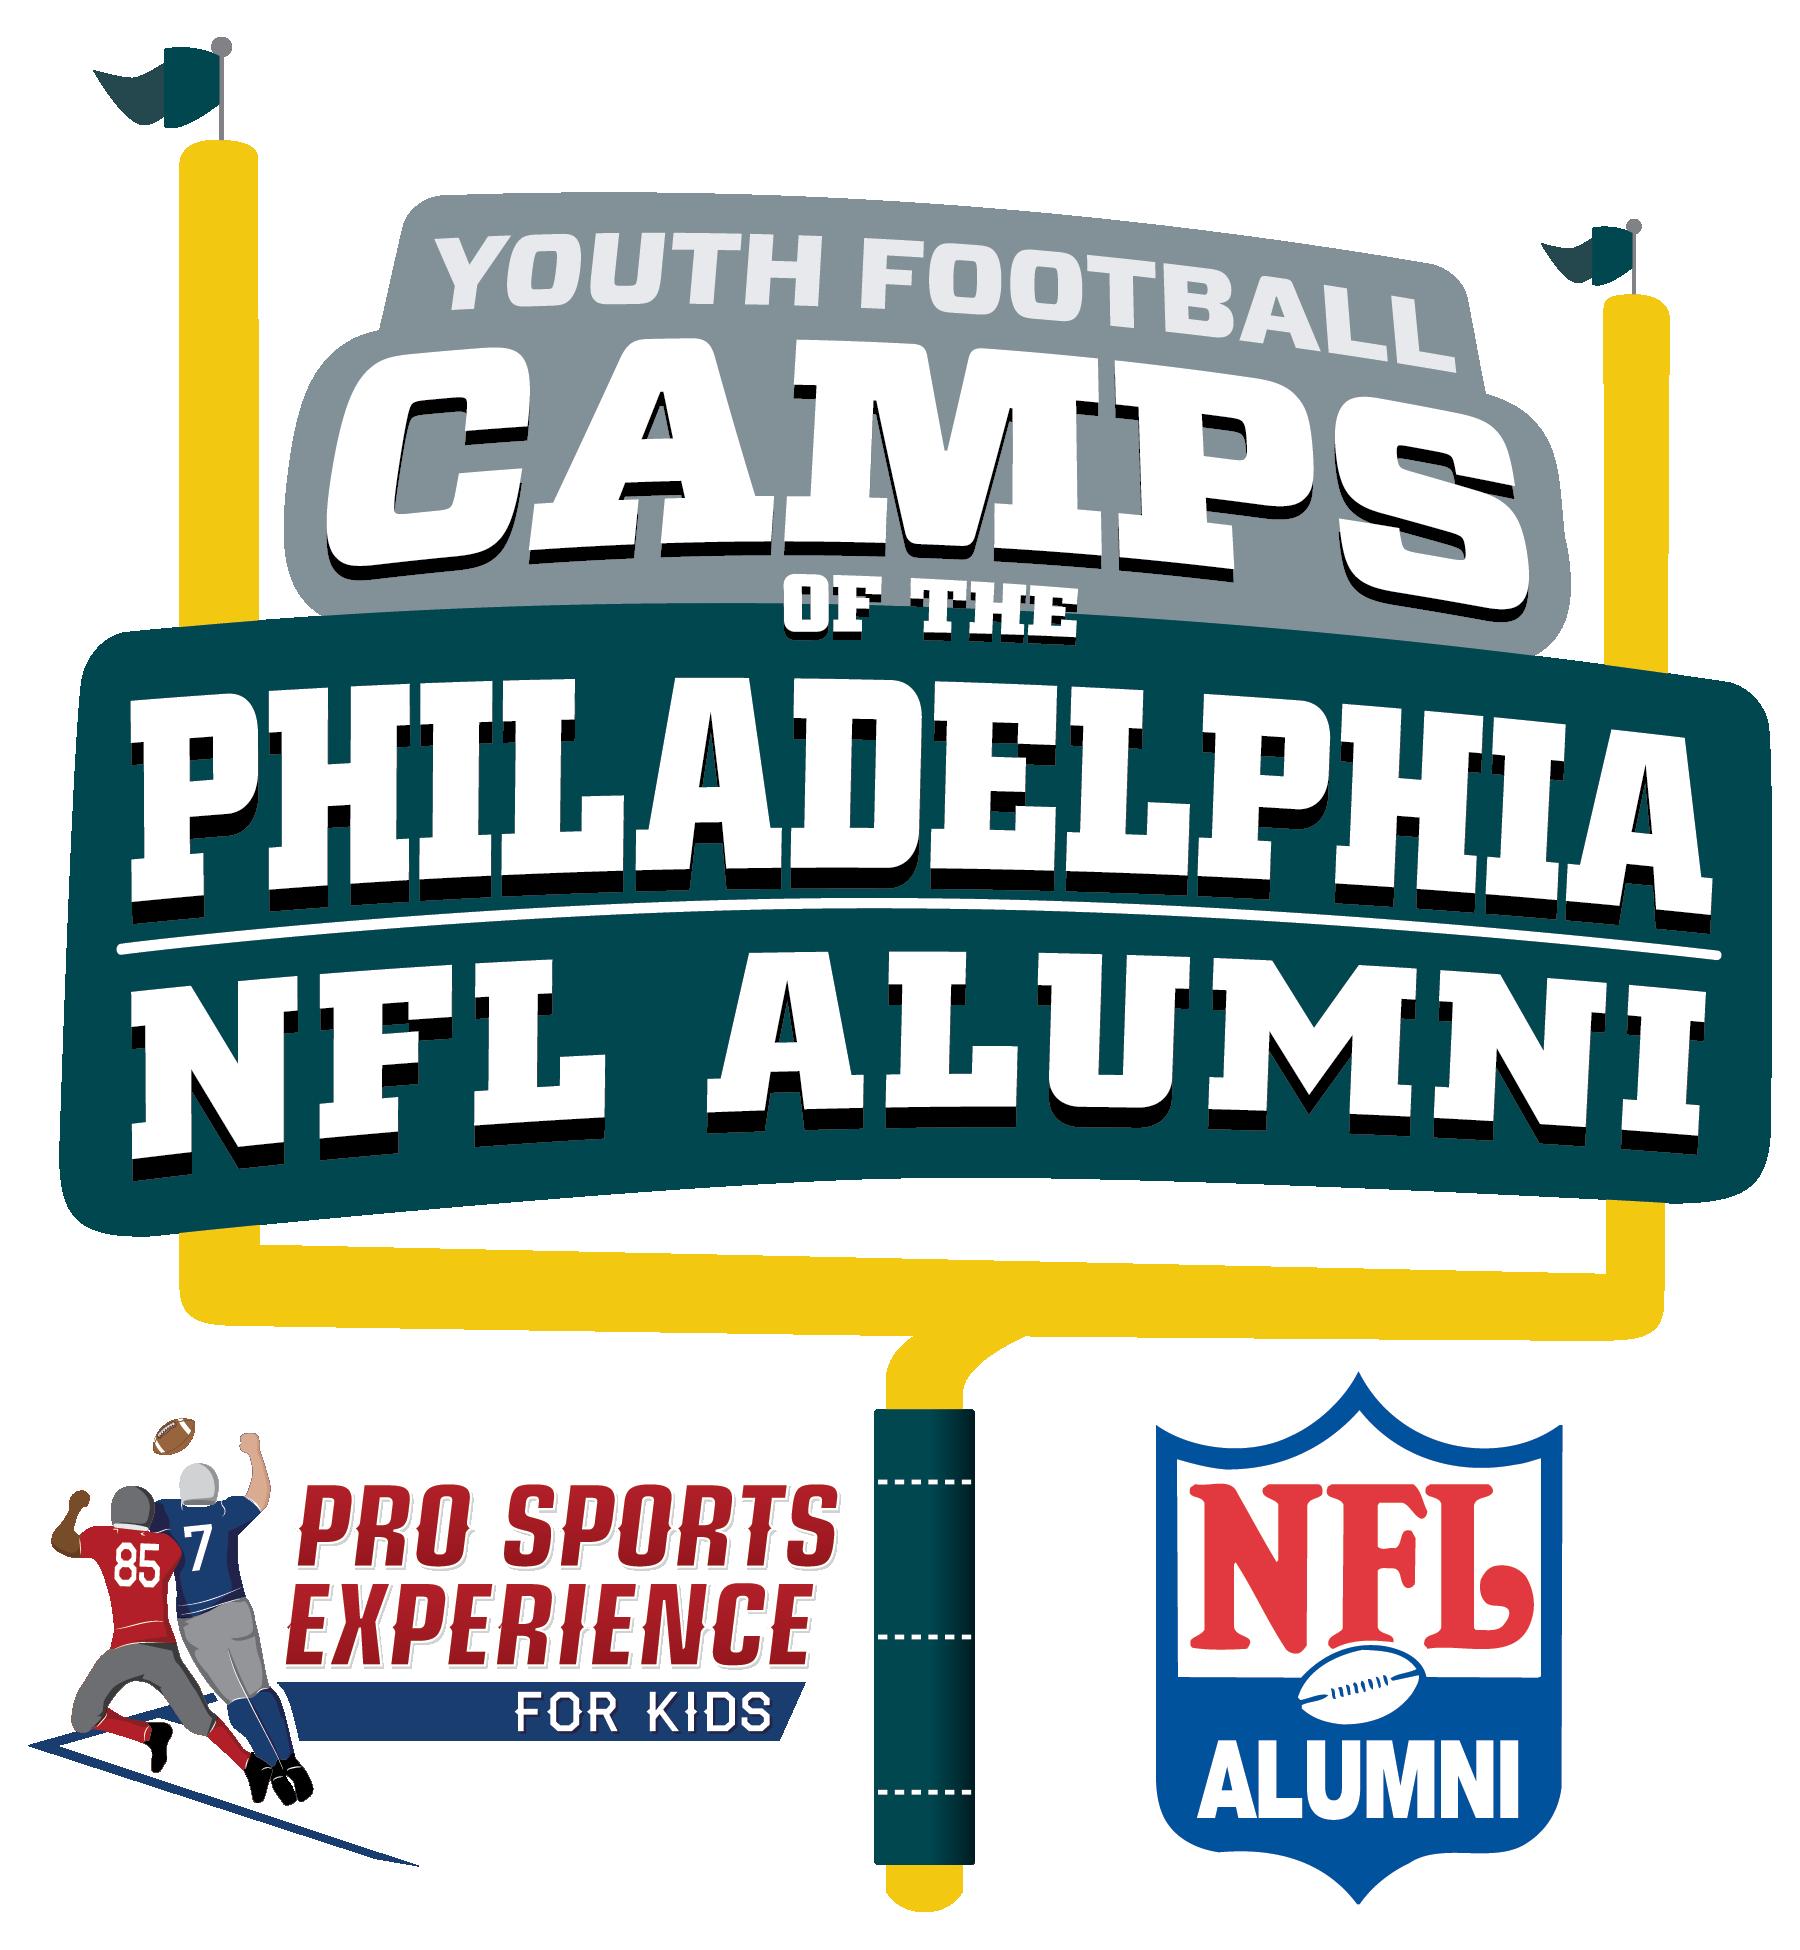 Philadelphia NFL Alumni Hero Youth Football Camps - Newtown